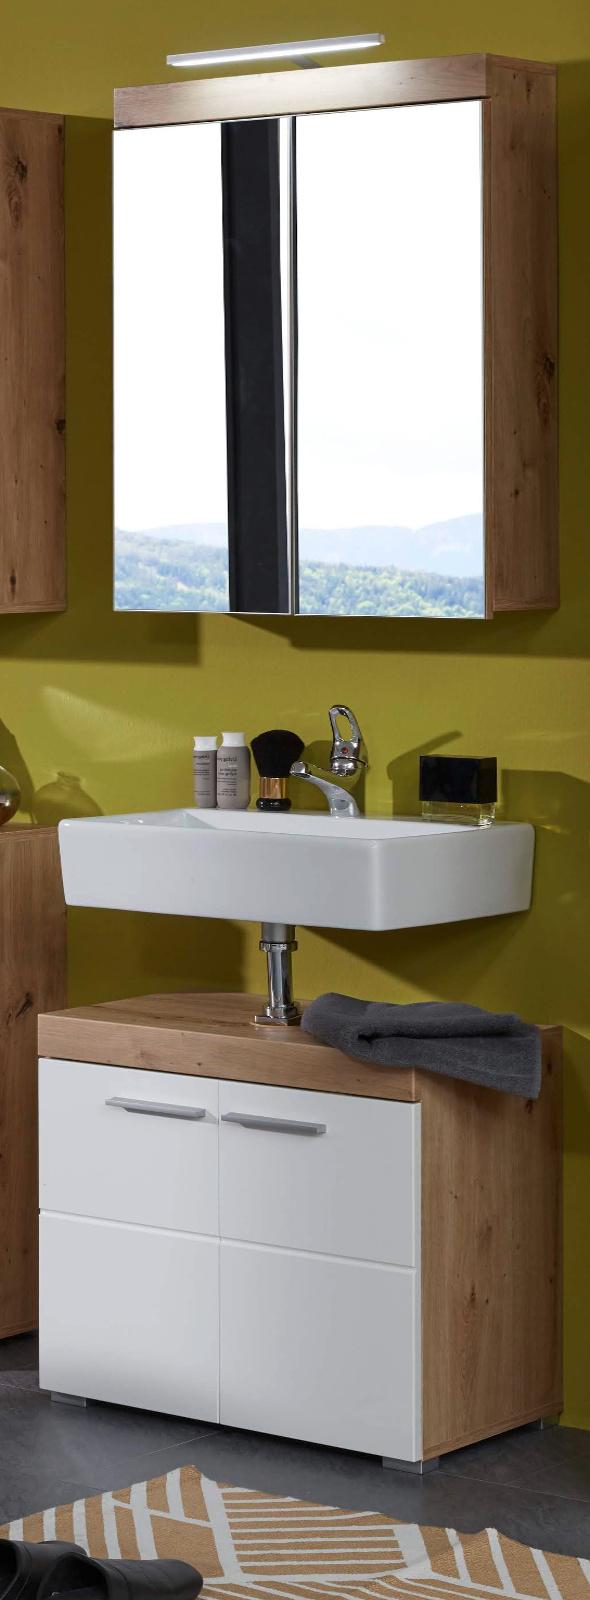 kinderbett jugendbett wei mixxi8 exklusive moderne. Black Bedroom Furniture Sets. Home Design Ideas